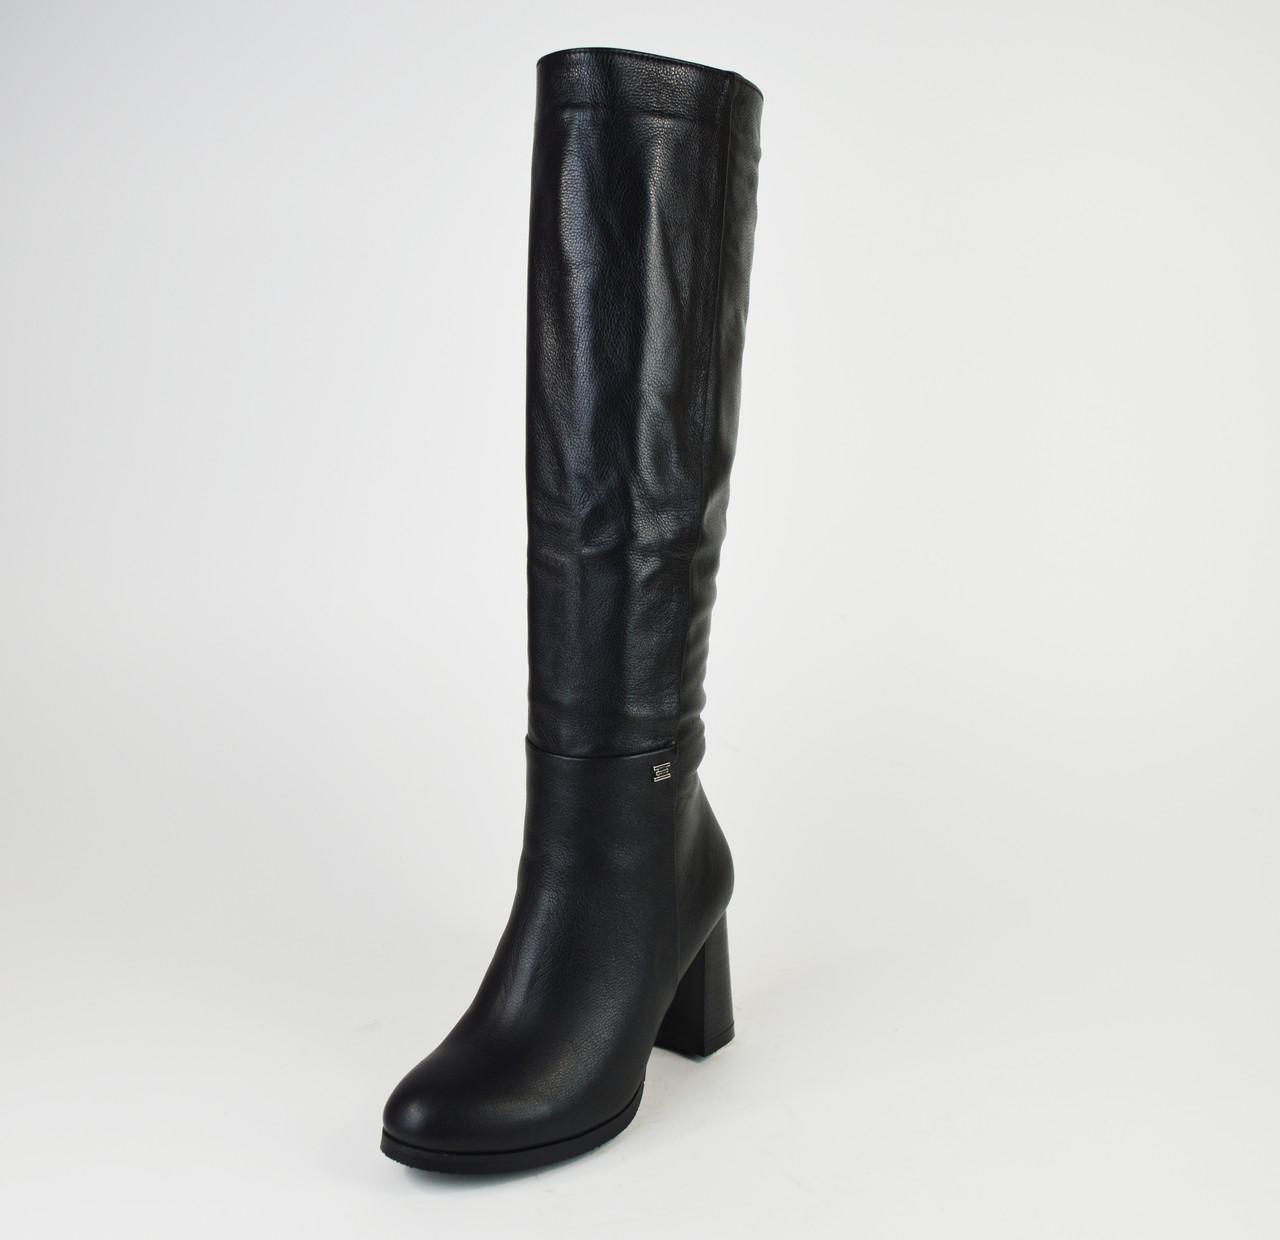 Сапоги женские кожаные Kluchini